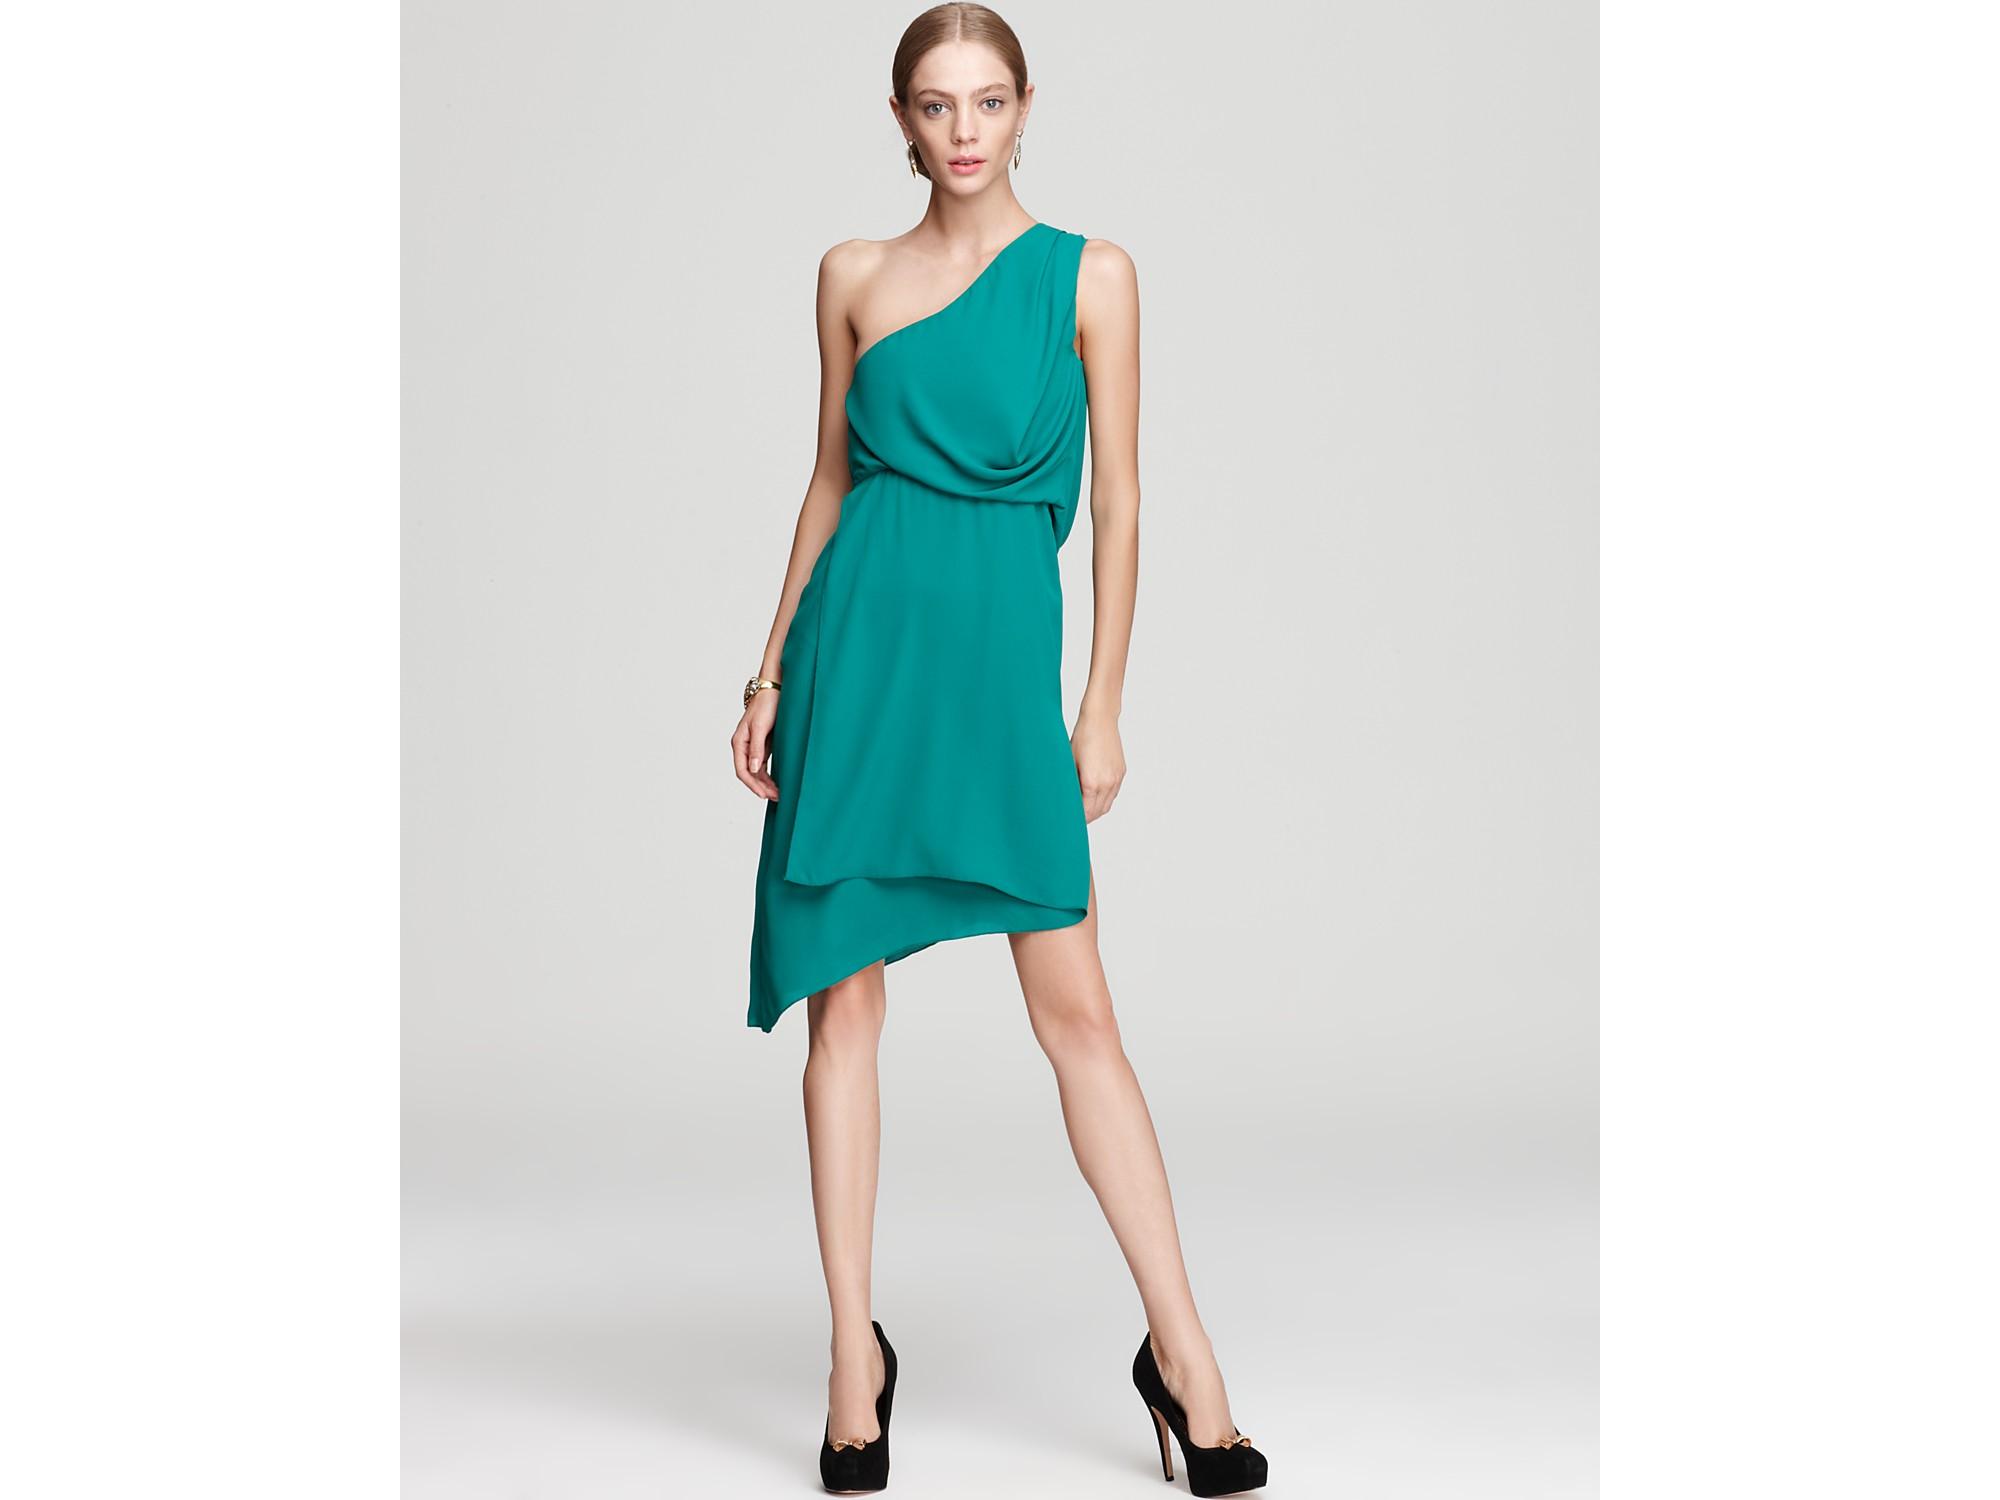 Lyst - Bcbgmaxazria One Shoulder Dress Somara Asymmetric in Blue